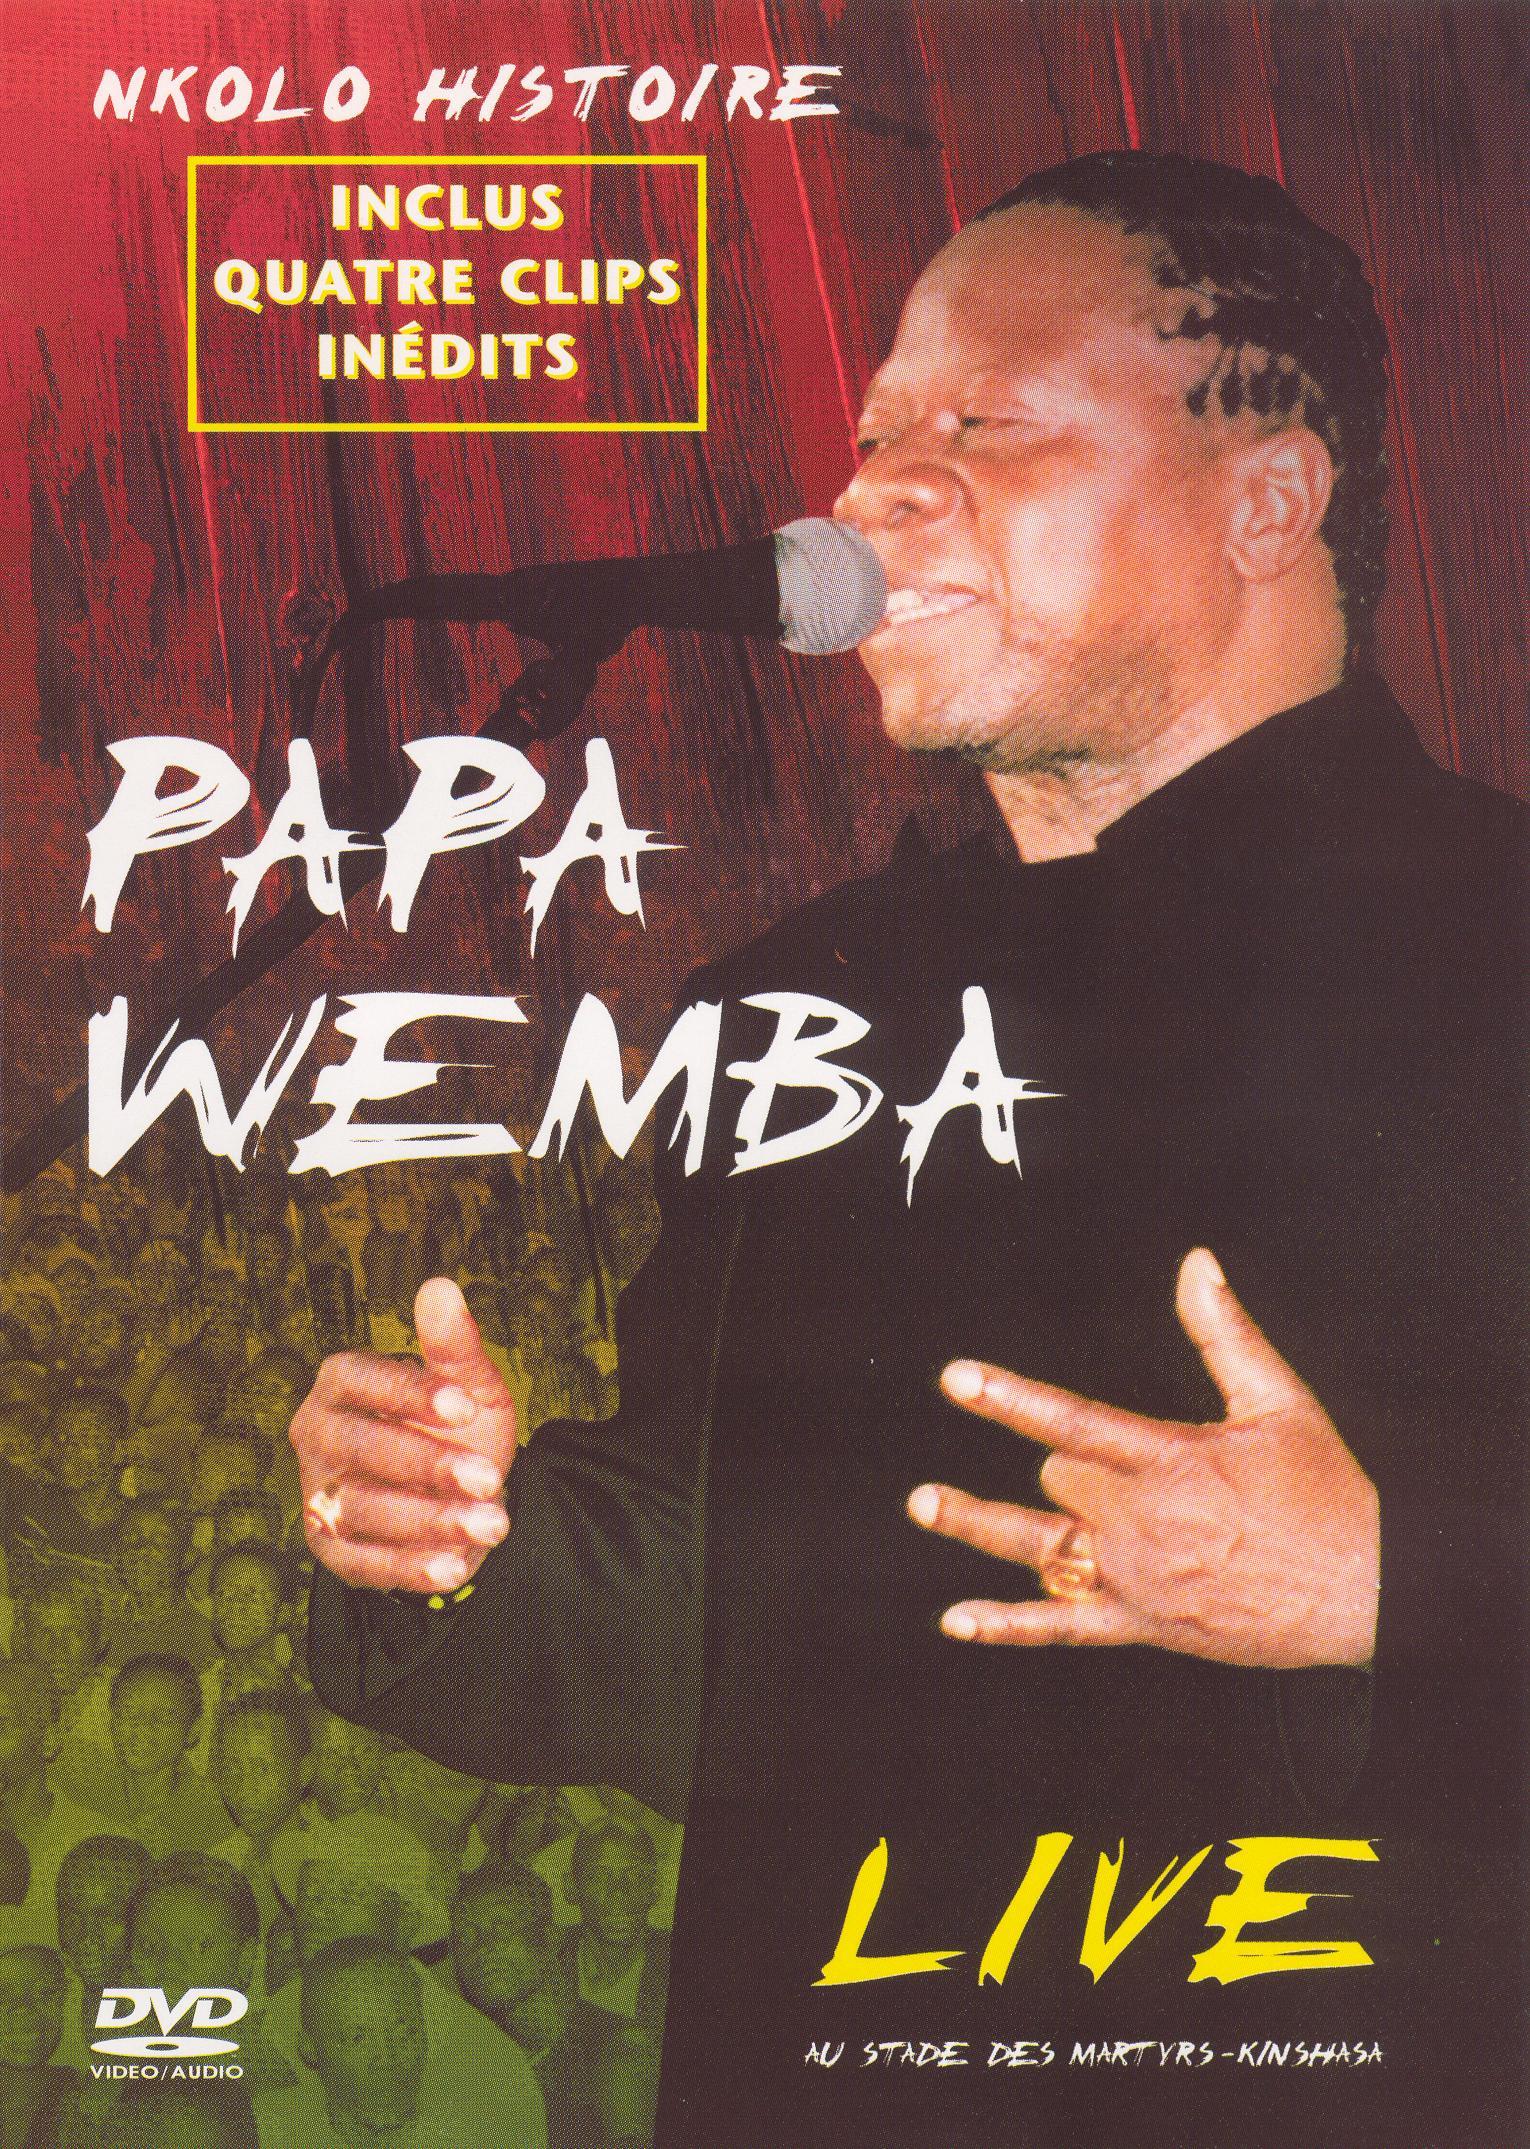 Papa Wemba and Viva La Musica: Nkolo Histoire